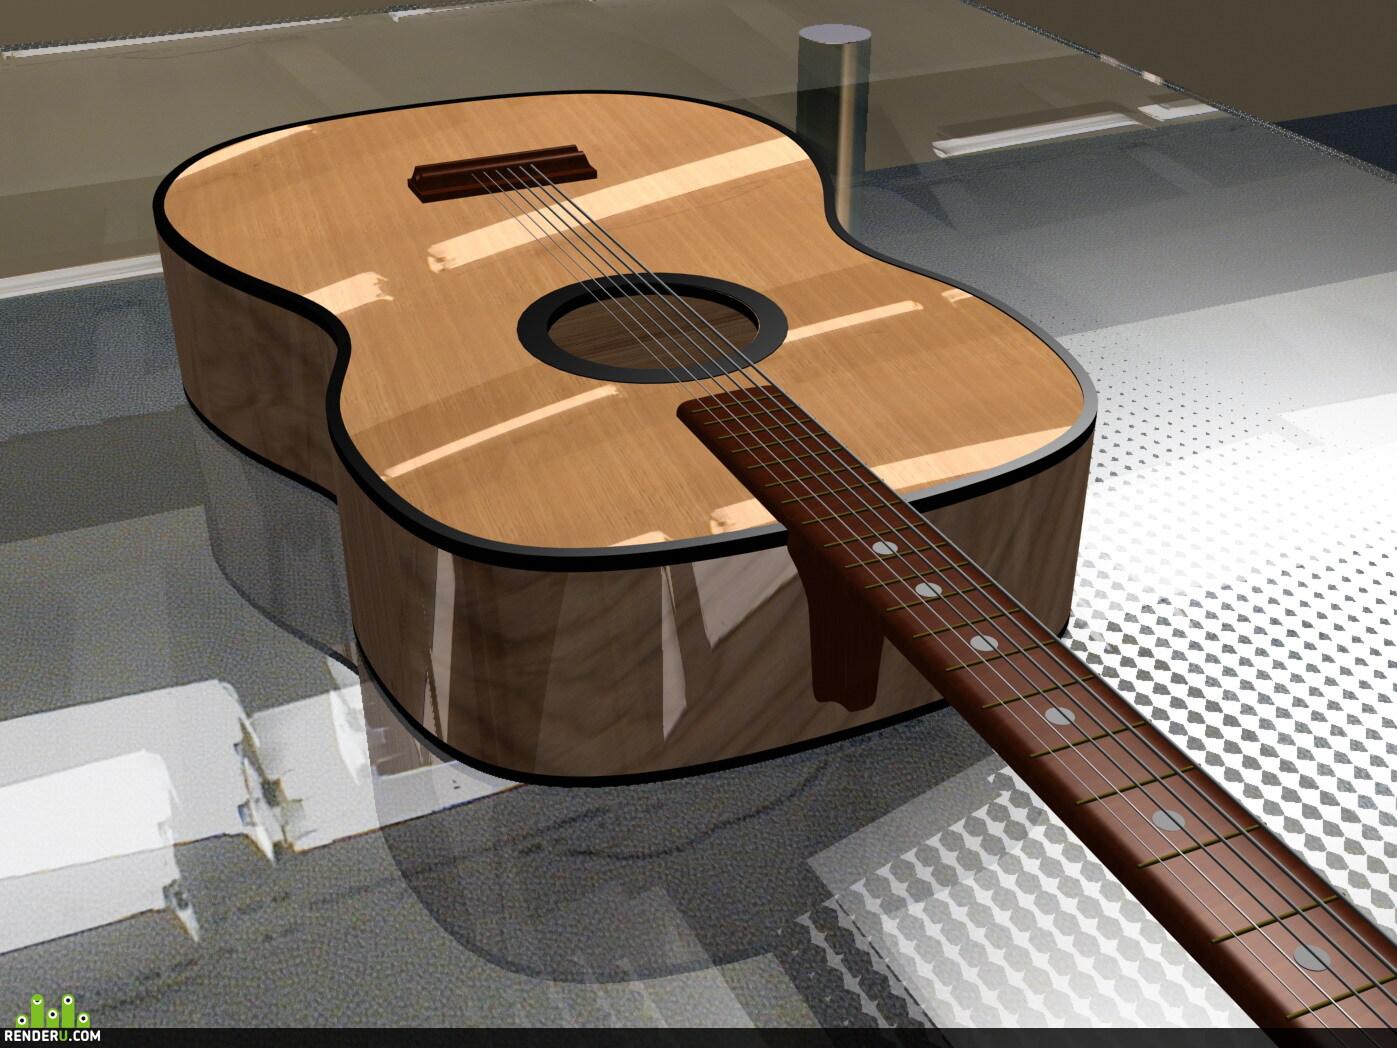 preview Гитара